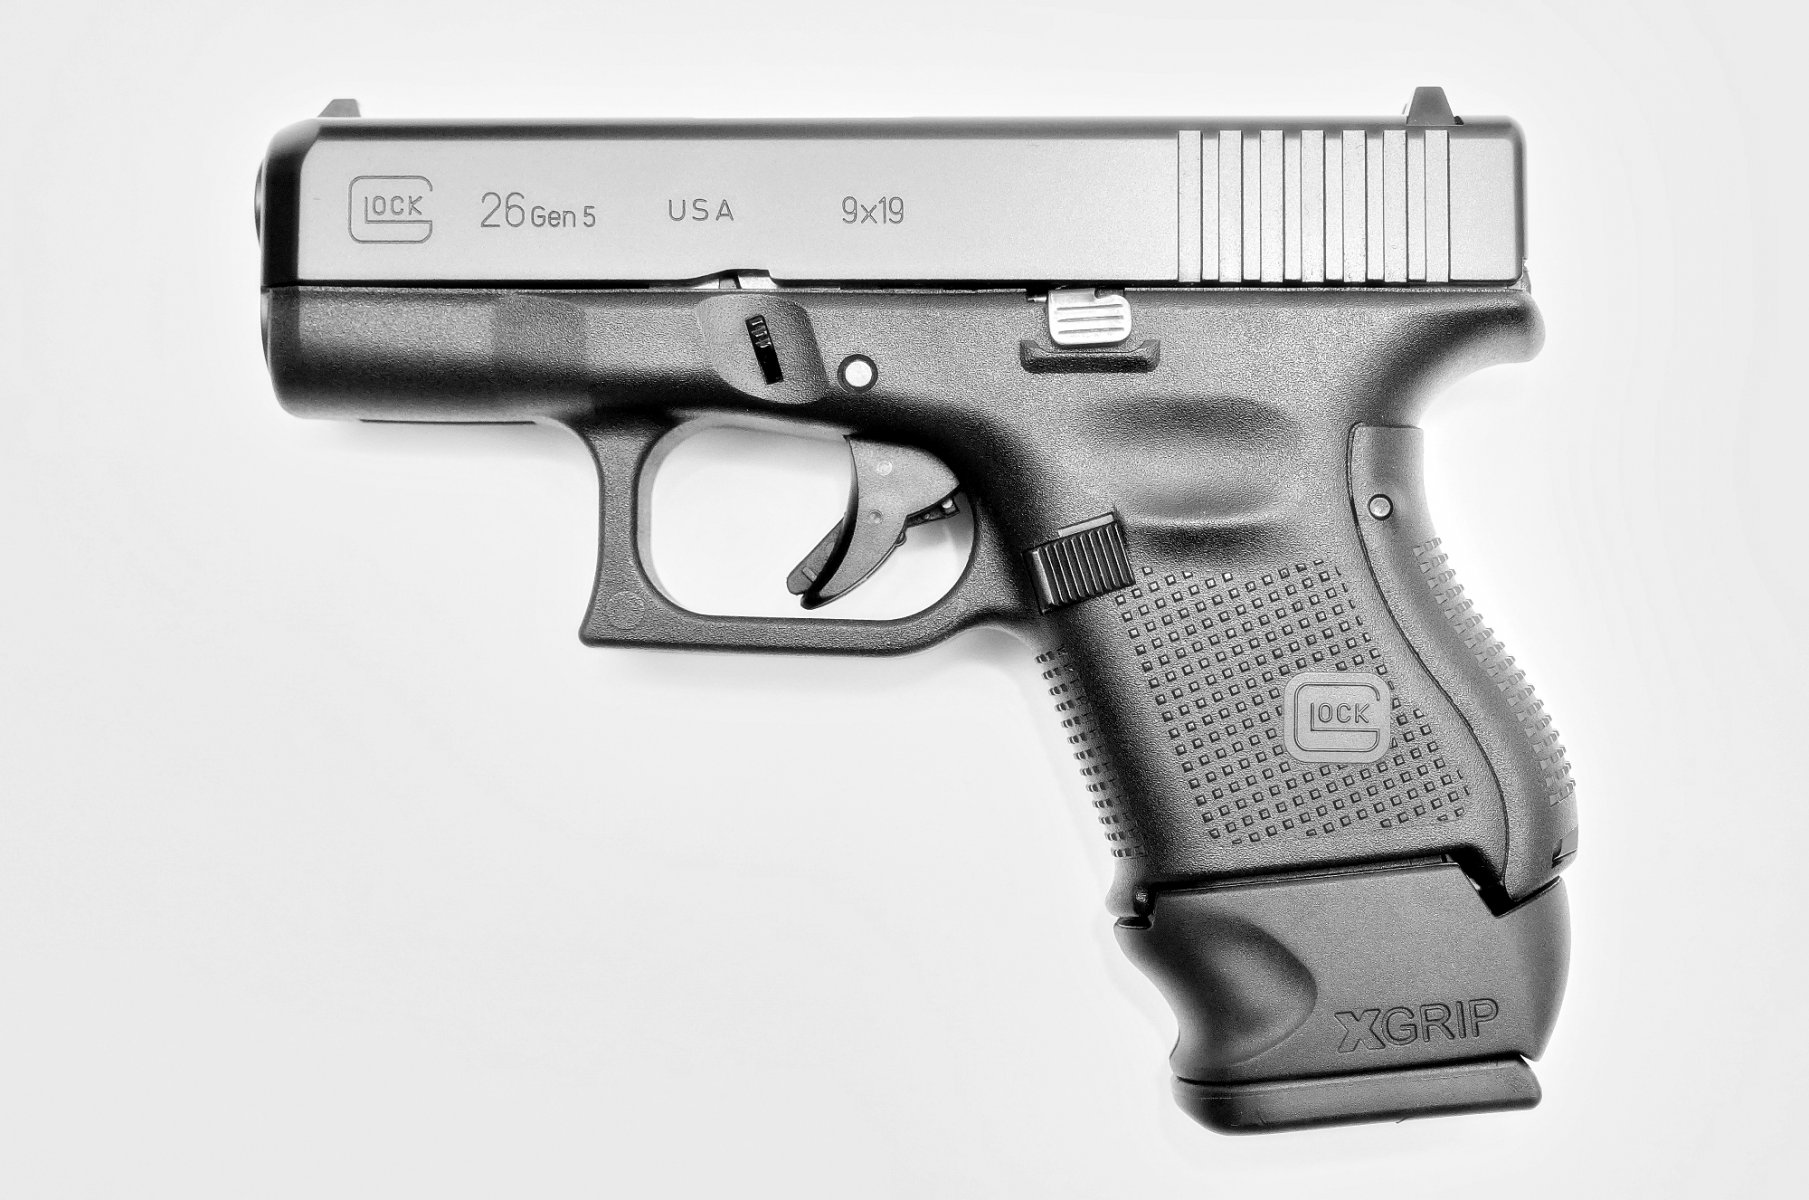 Glock26Gen5G19XGrip.JPG